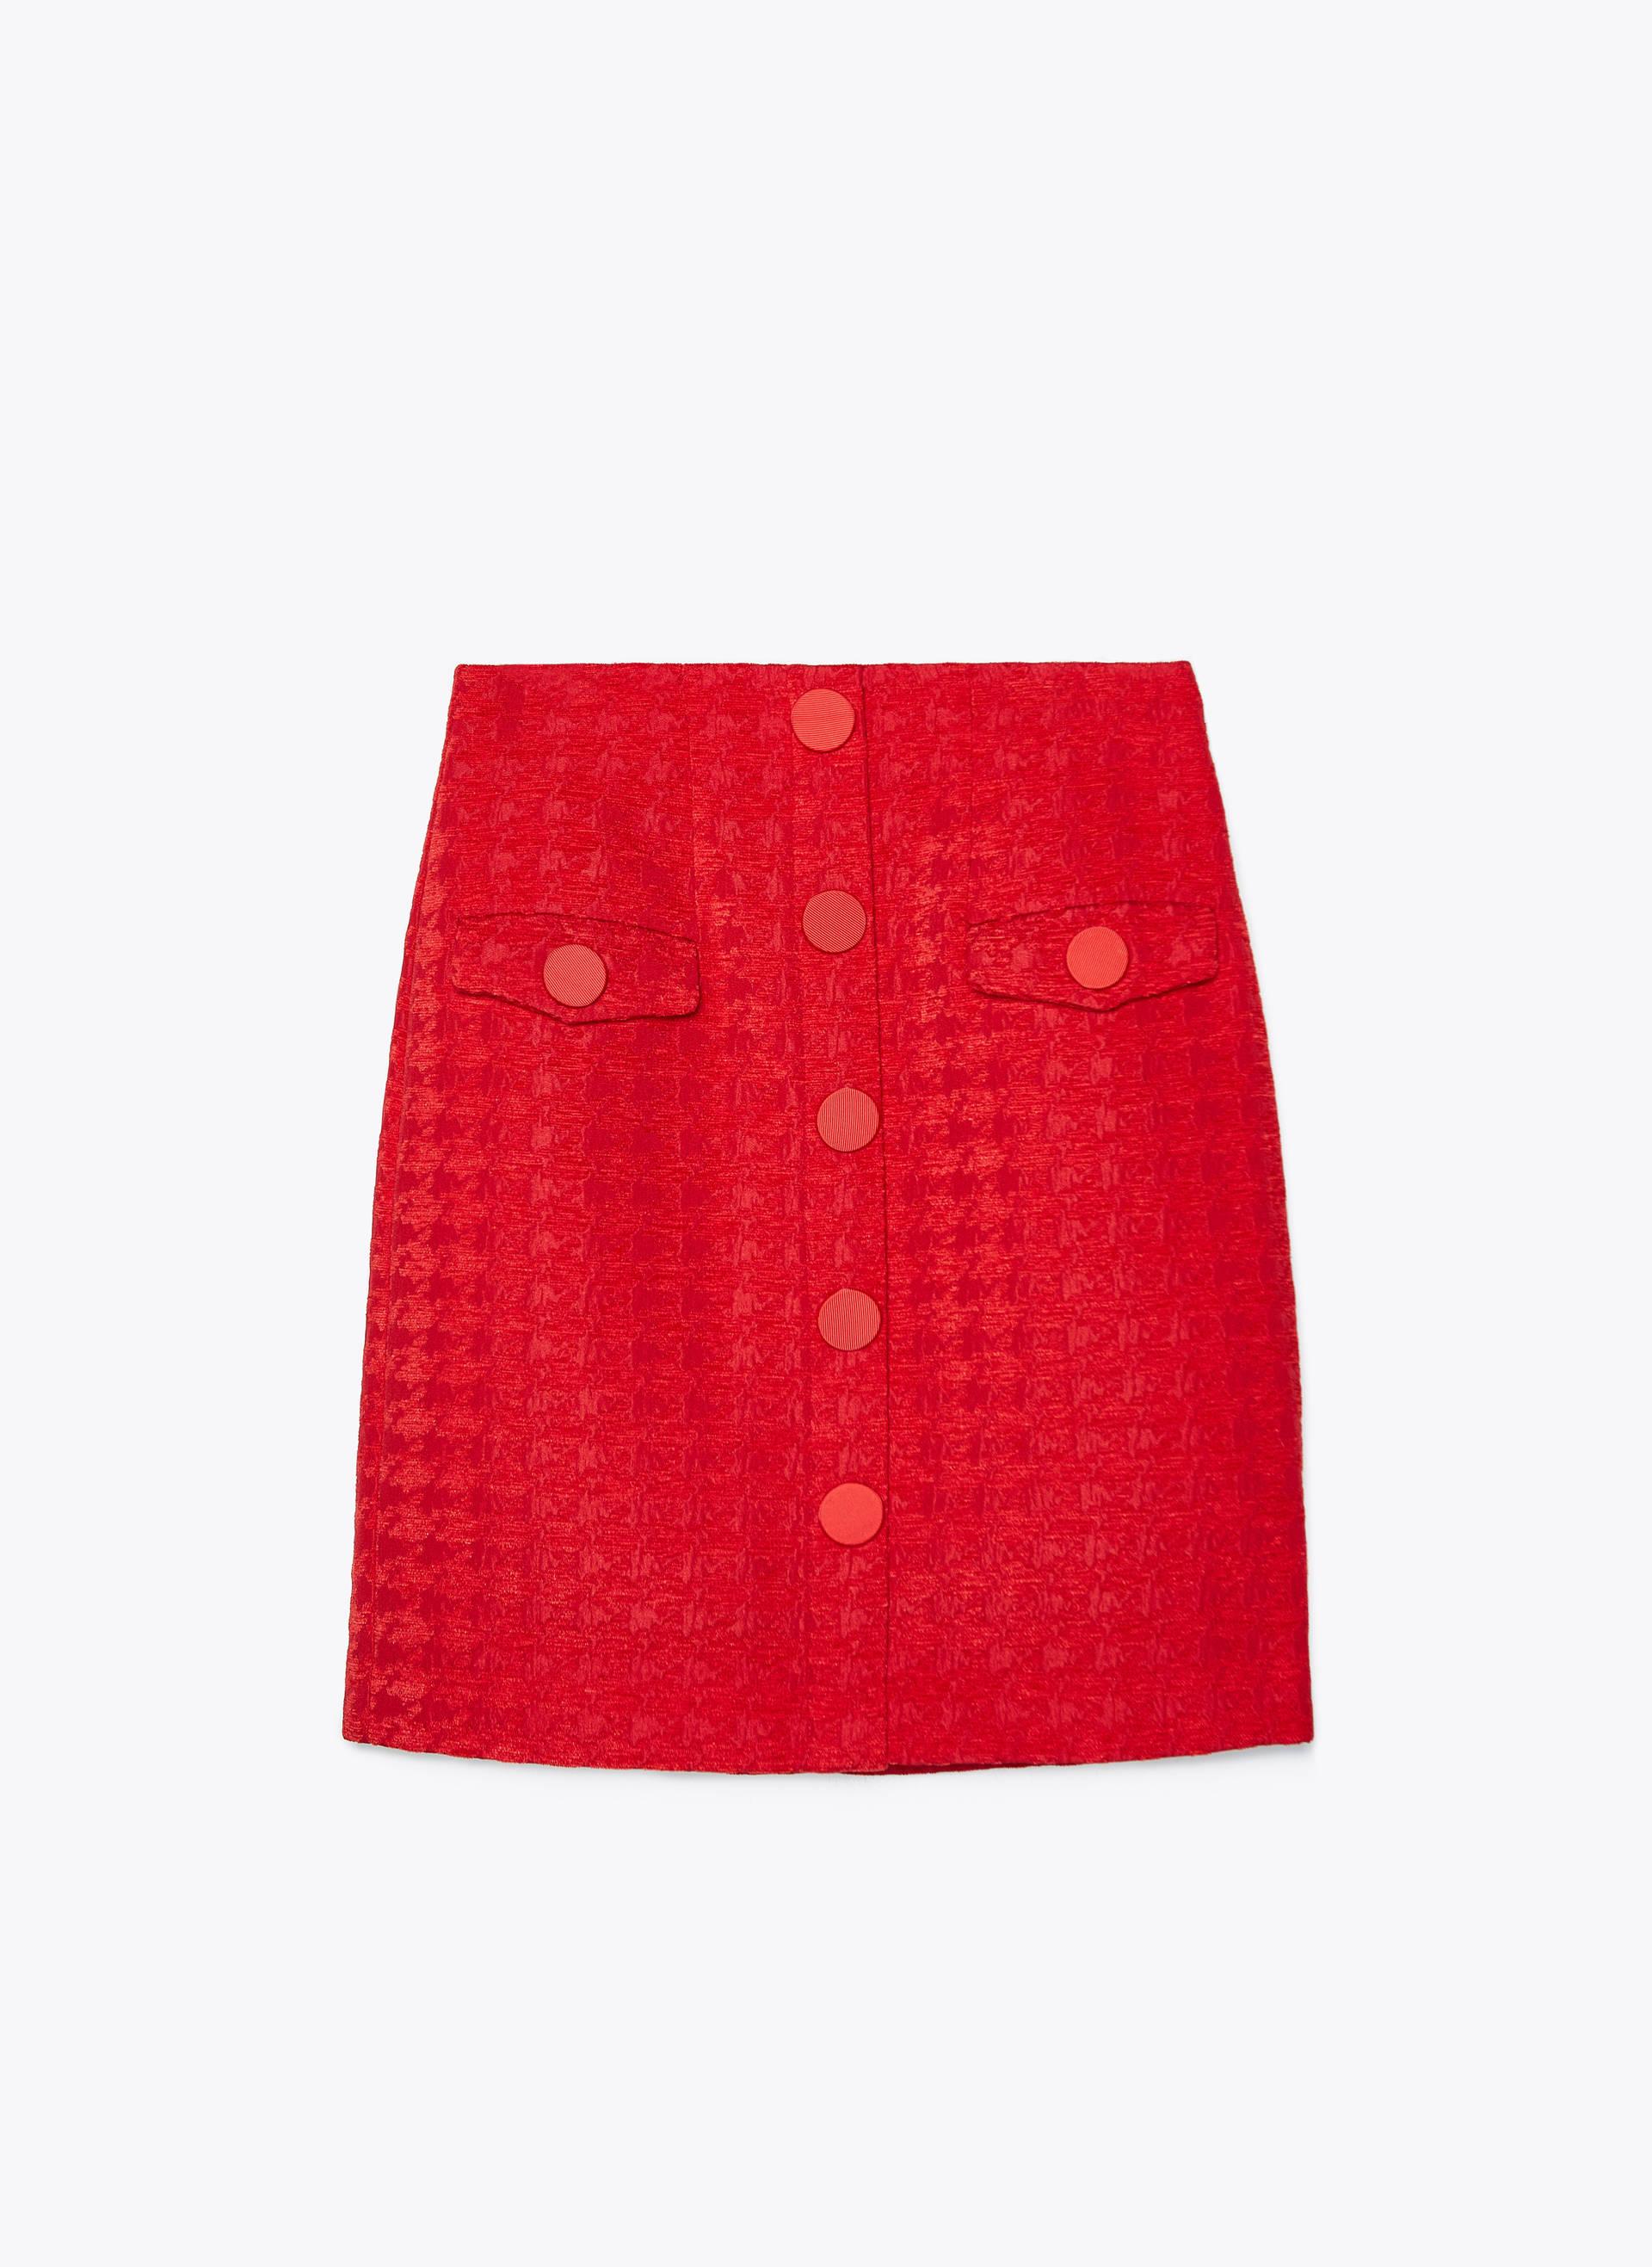 Hot matures teenagers mini skirts woman skirts fall